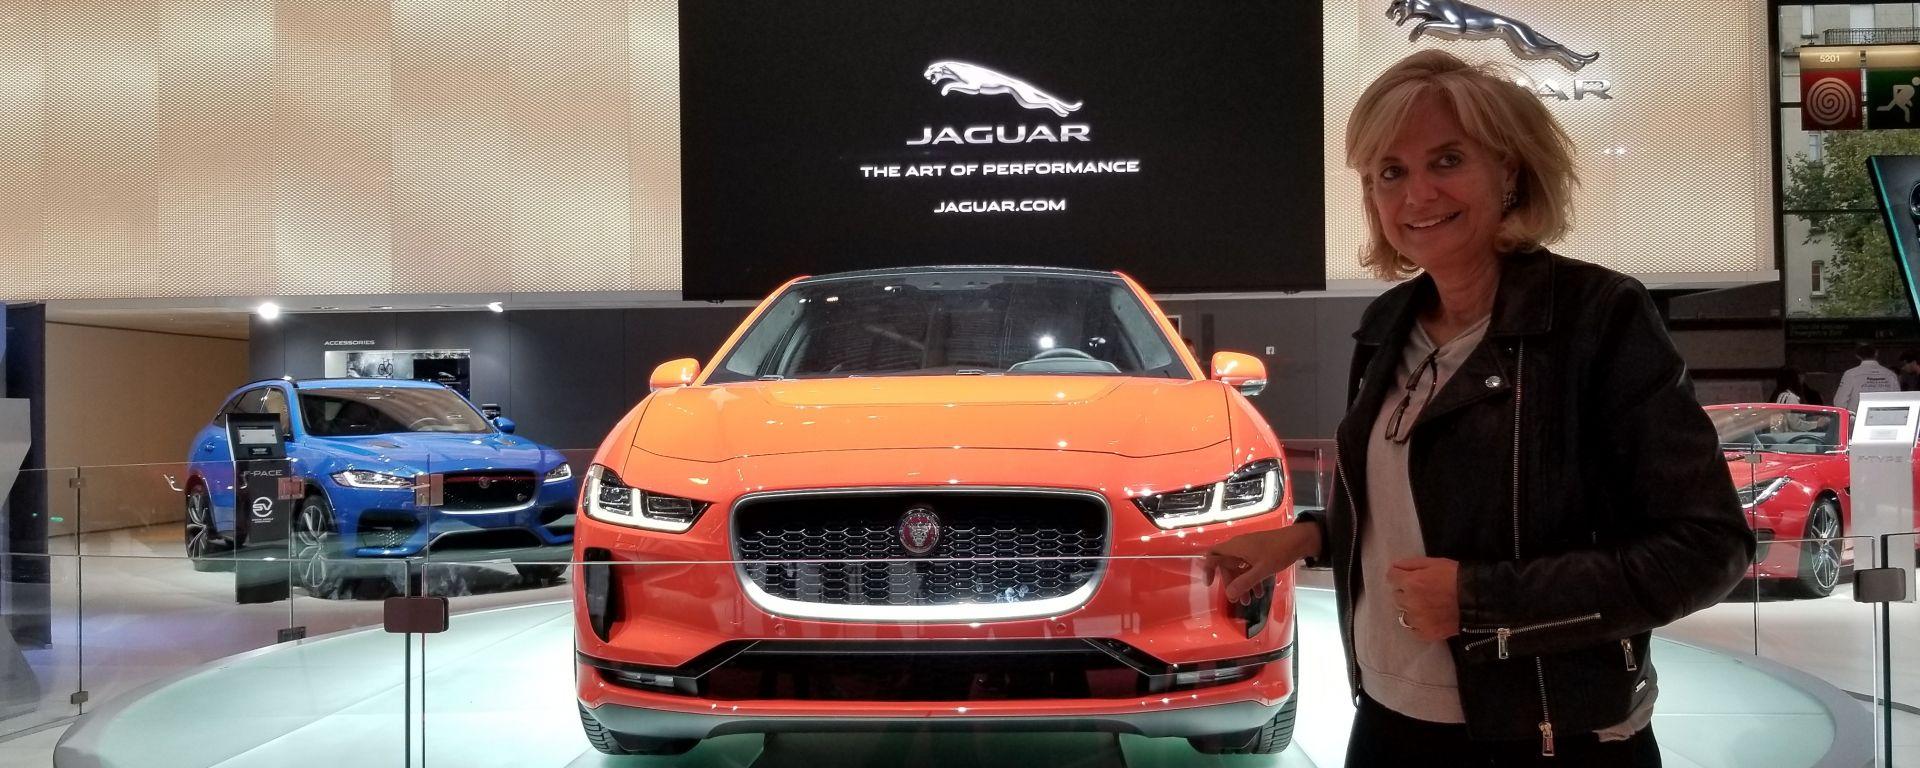 Novità Jaguar a Parigi 2018: intervista a Lidia Dainelli